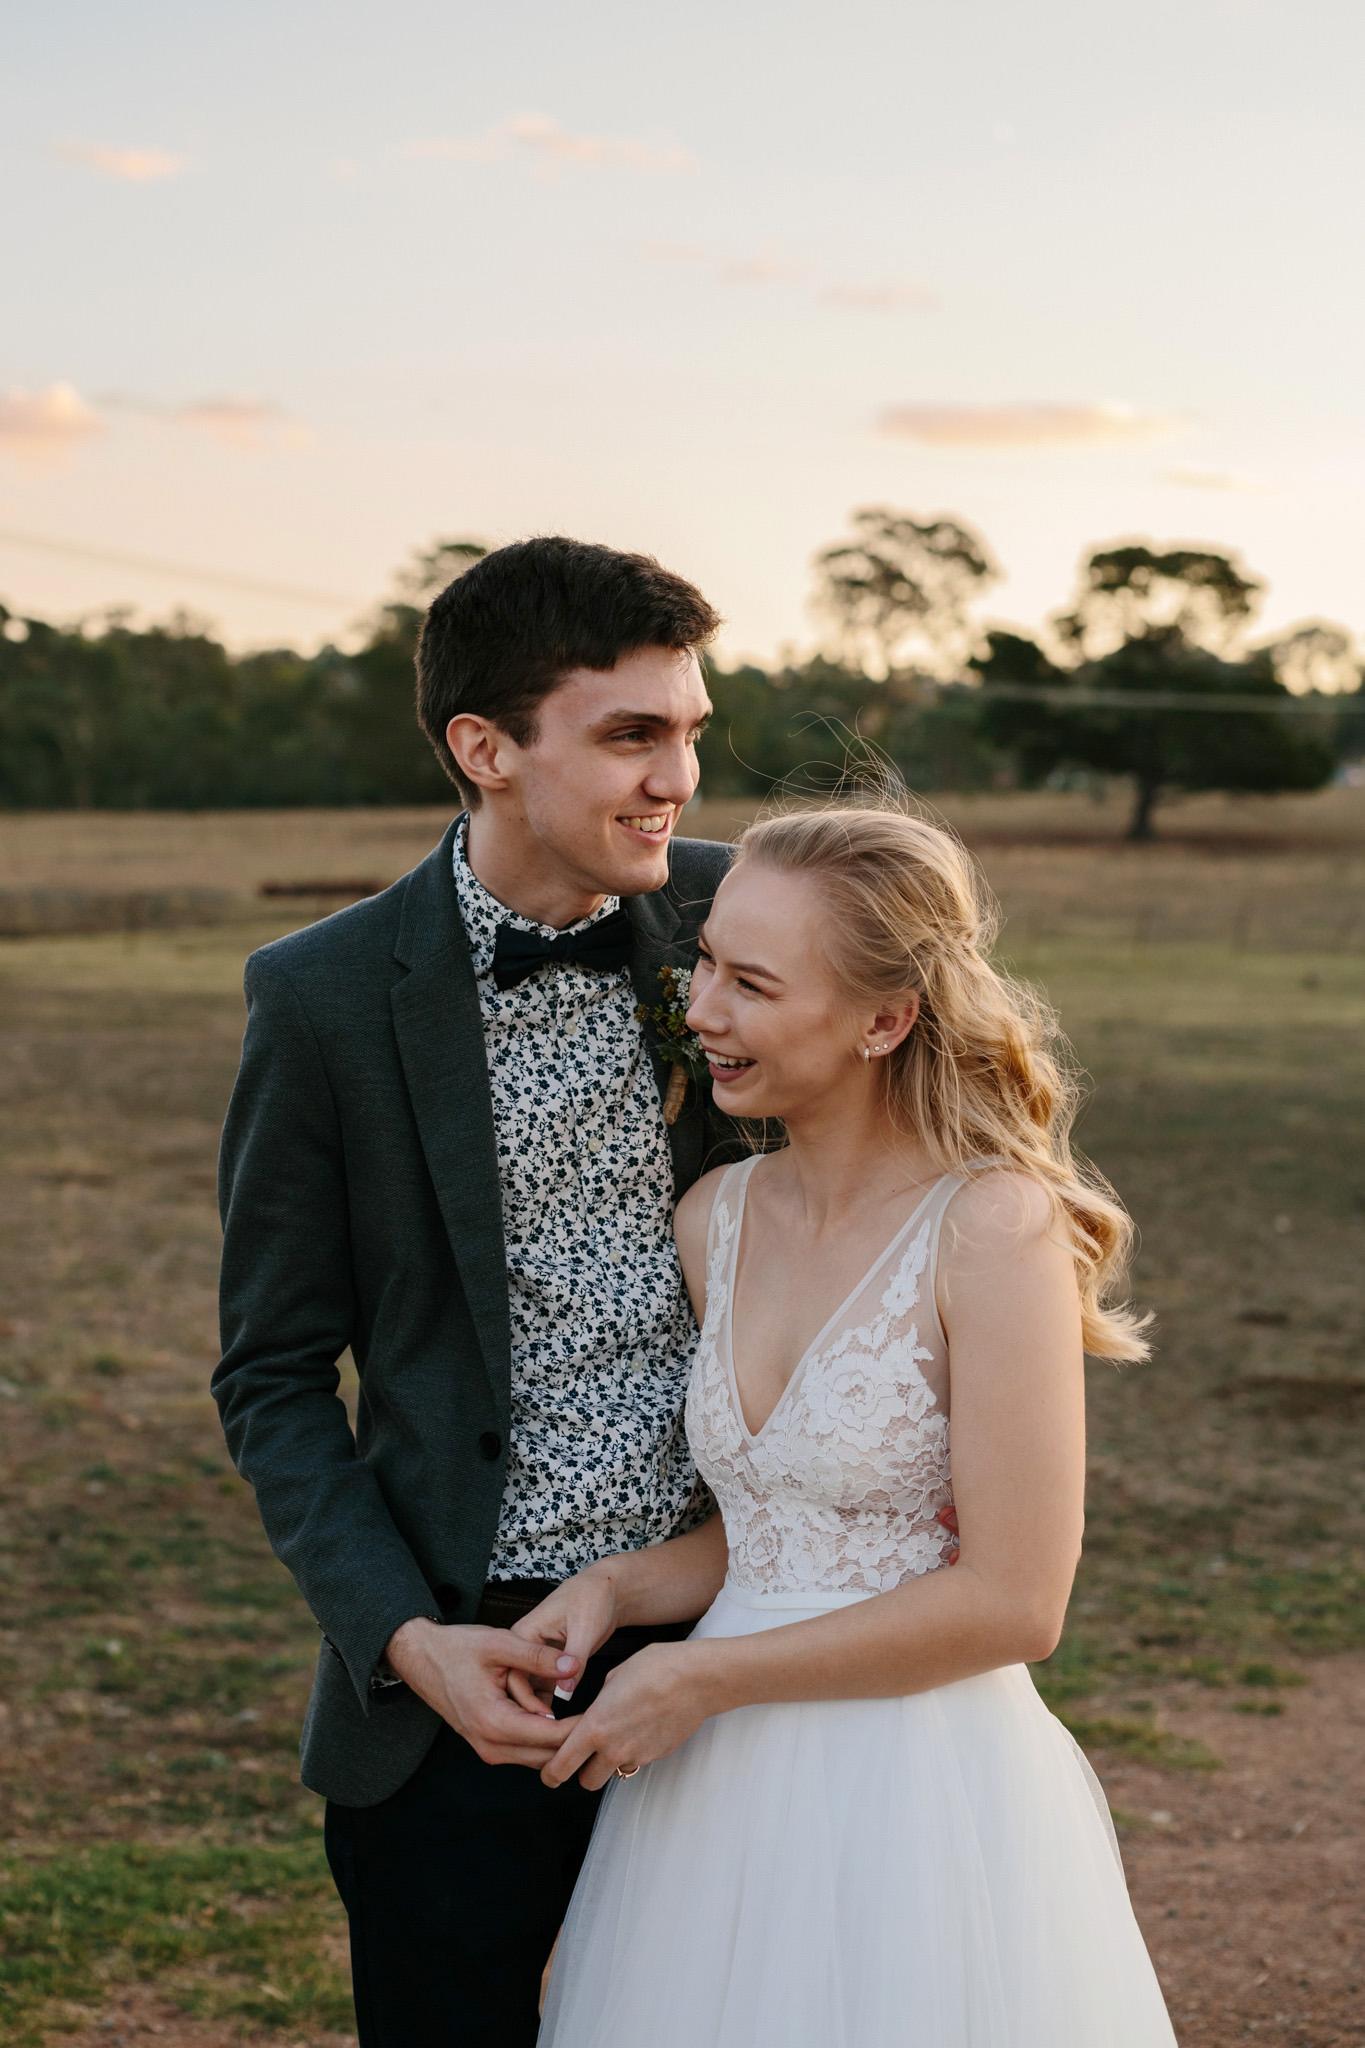 Erin_Latimore_Mudgee_Canberra_Wedding_Photographer_Tuggeranong_Homestead_496.JPG